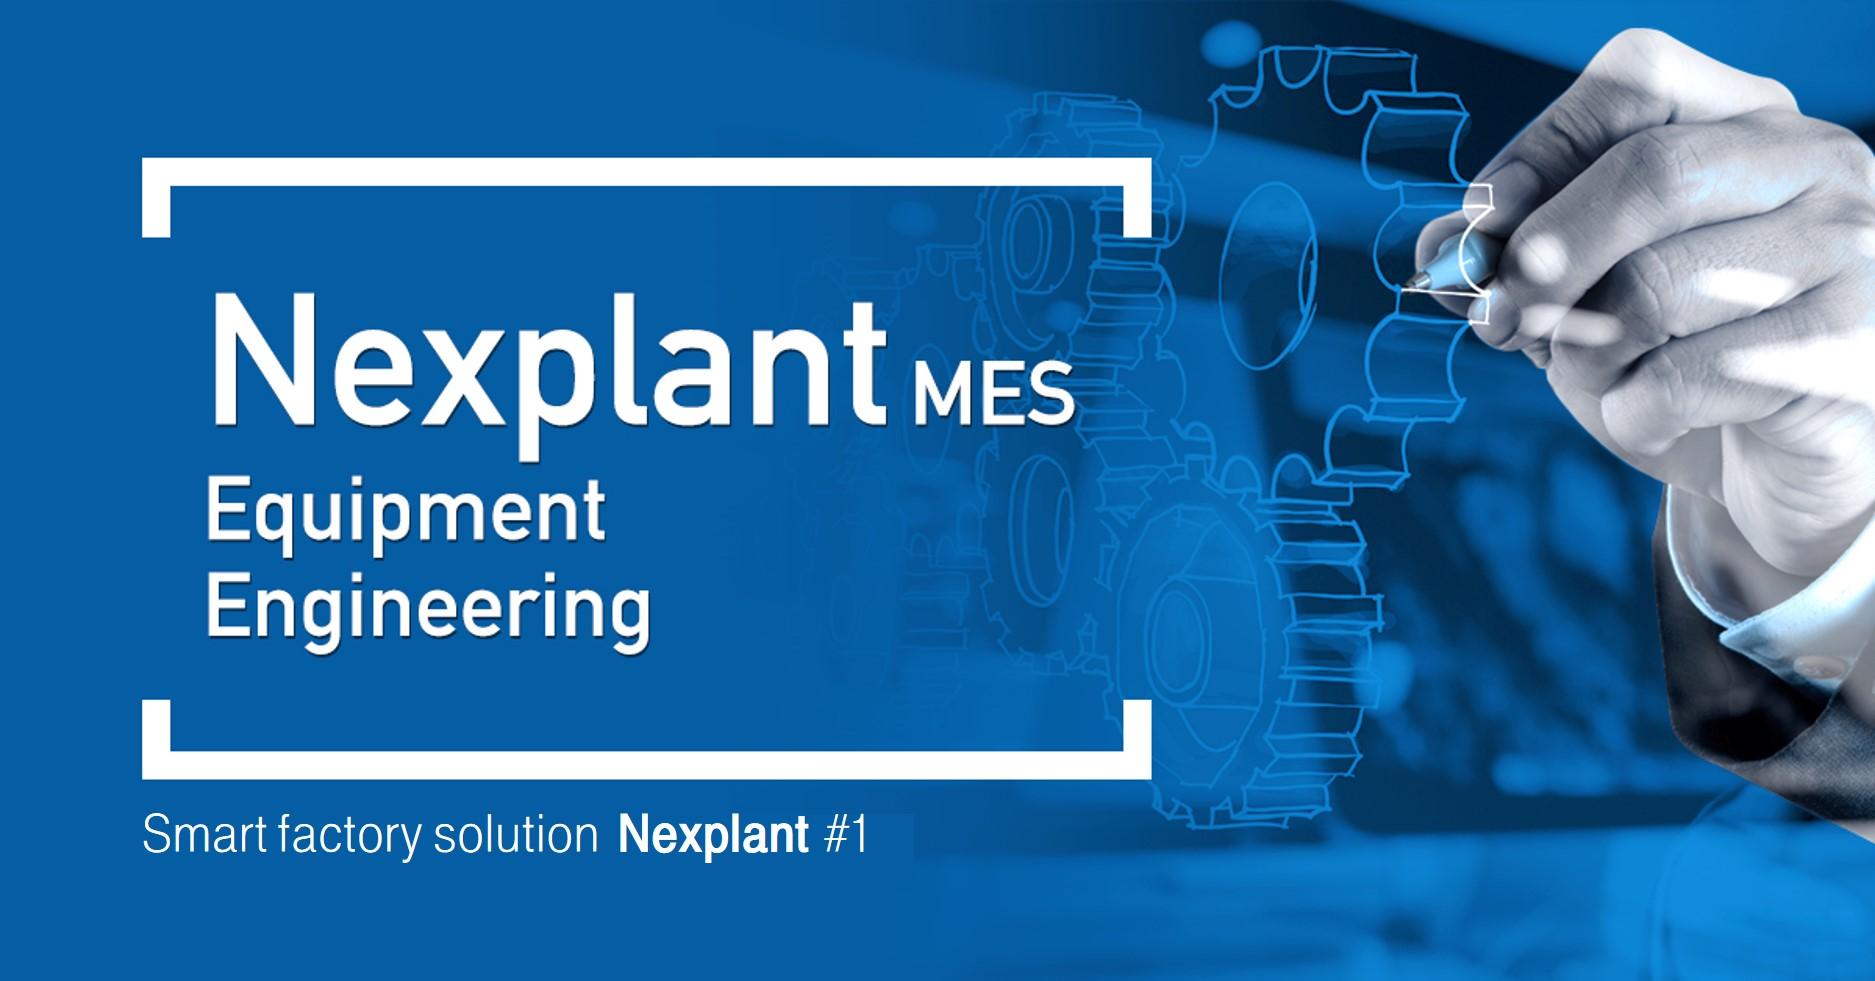 Nexplant MES Equipment Engineering